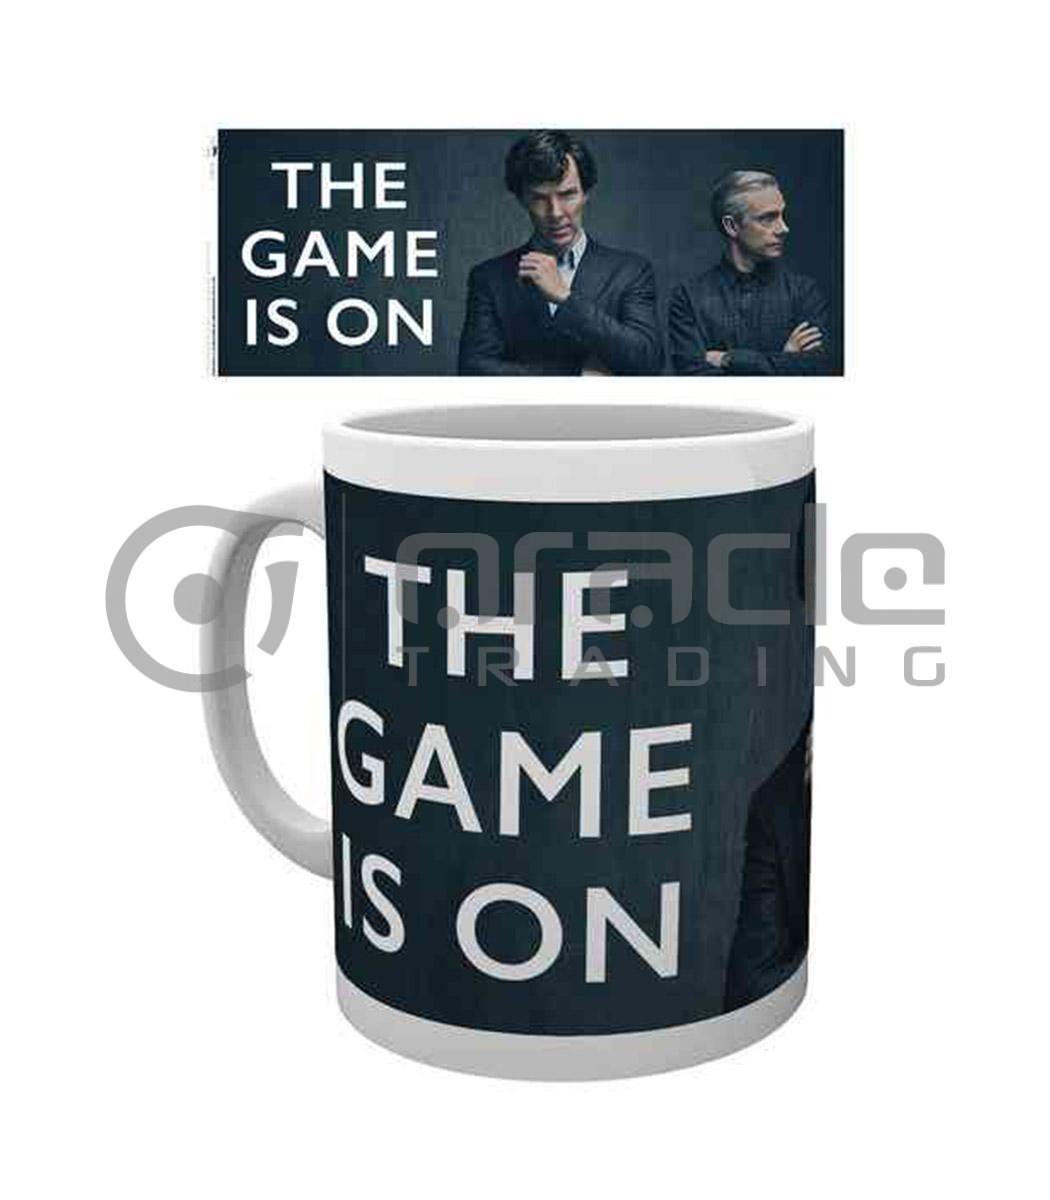 Sherlock The Game is On Mug